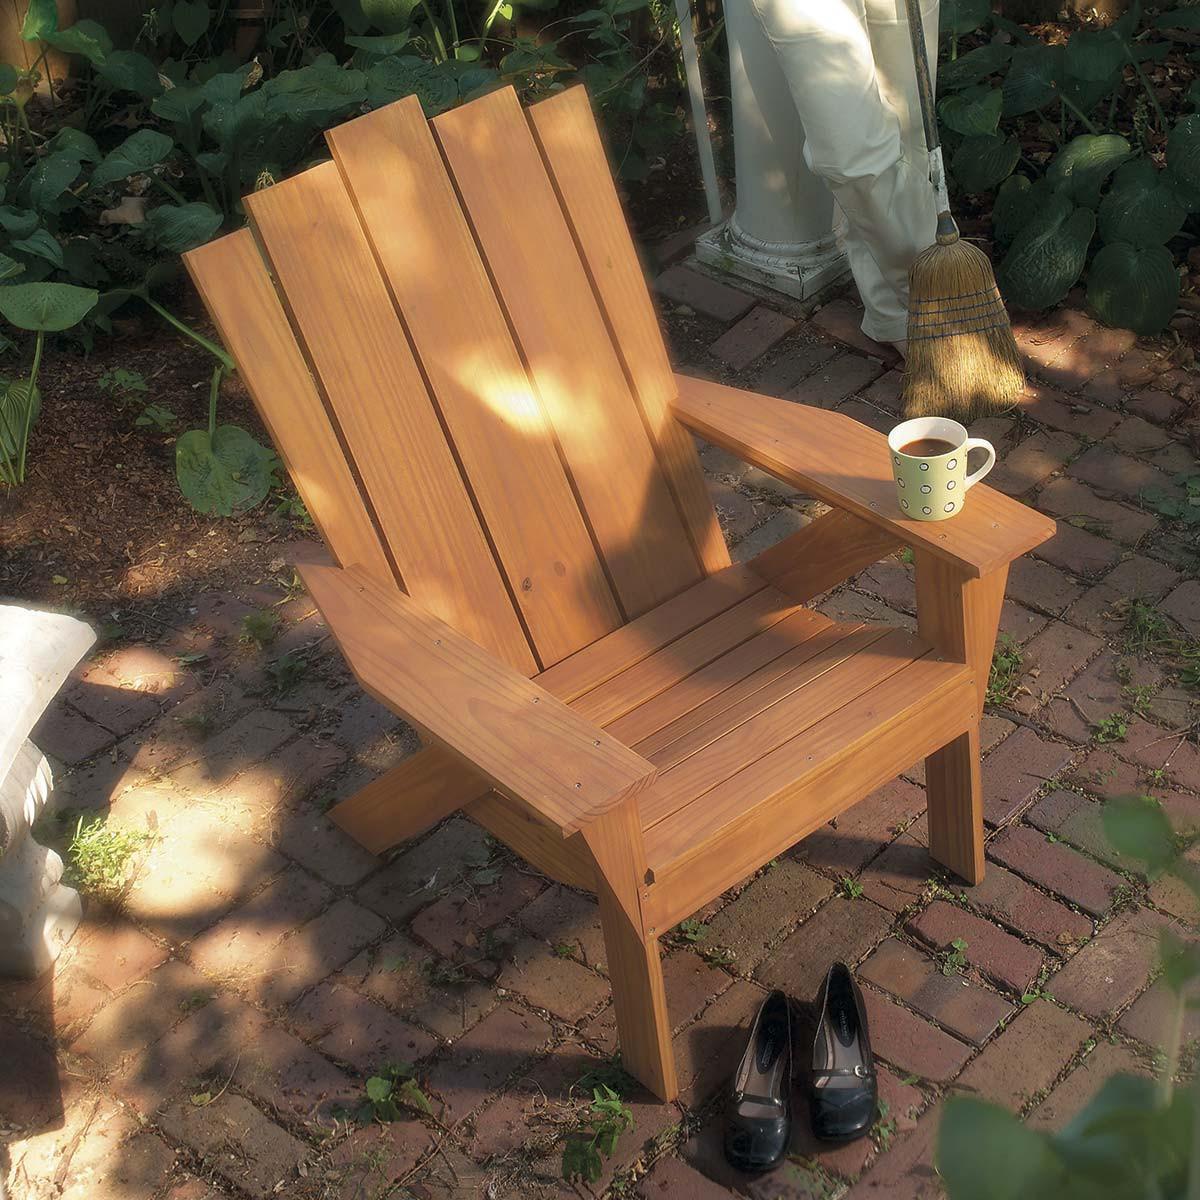 DIY Wood Projects  The Top 10 DIY Wood Projects — The Family Handyman